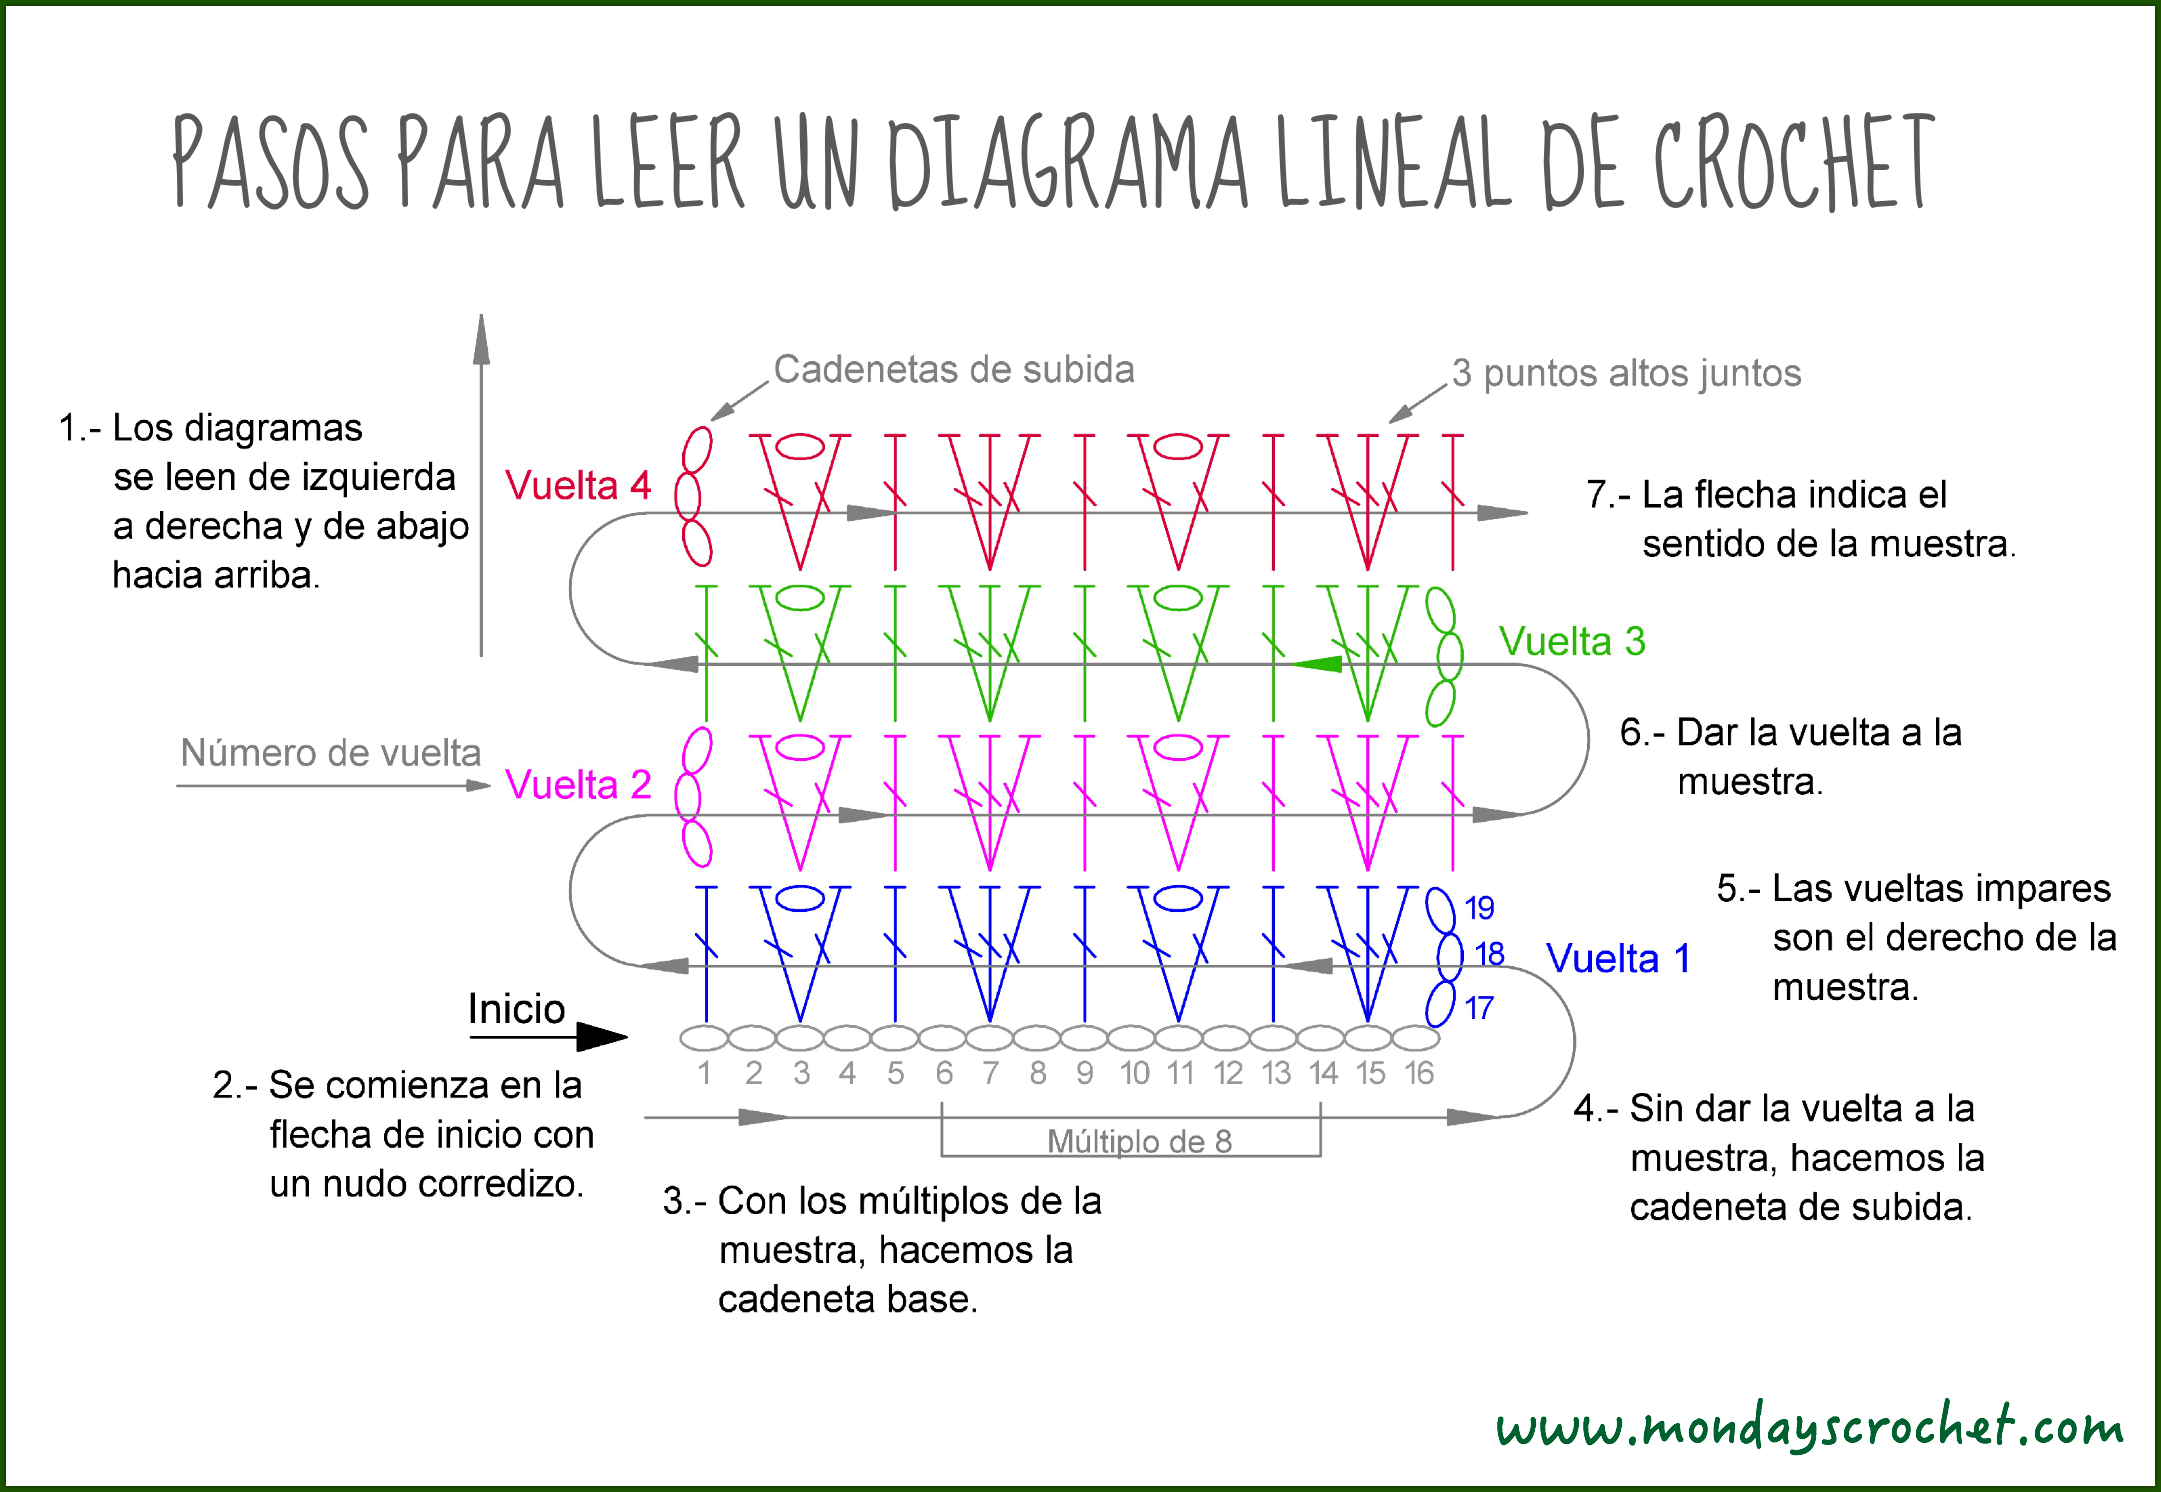 CLASE 5. CÓMO LEER UN DIAGRAMA LINEAL DE CROCHET / CLASS 5. HOW TO ...